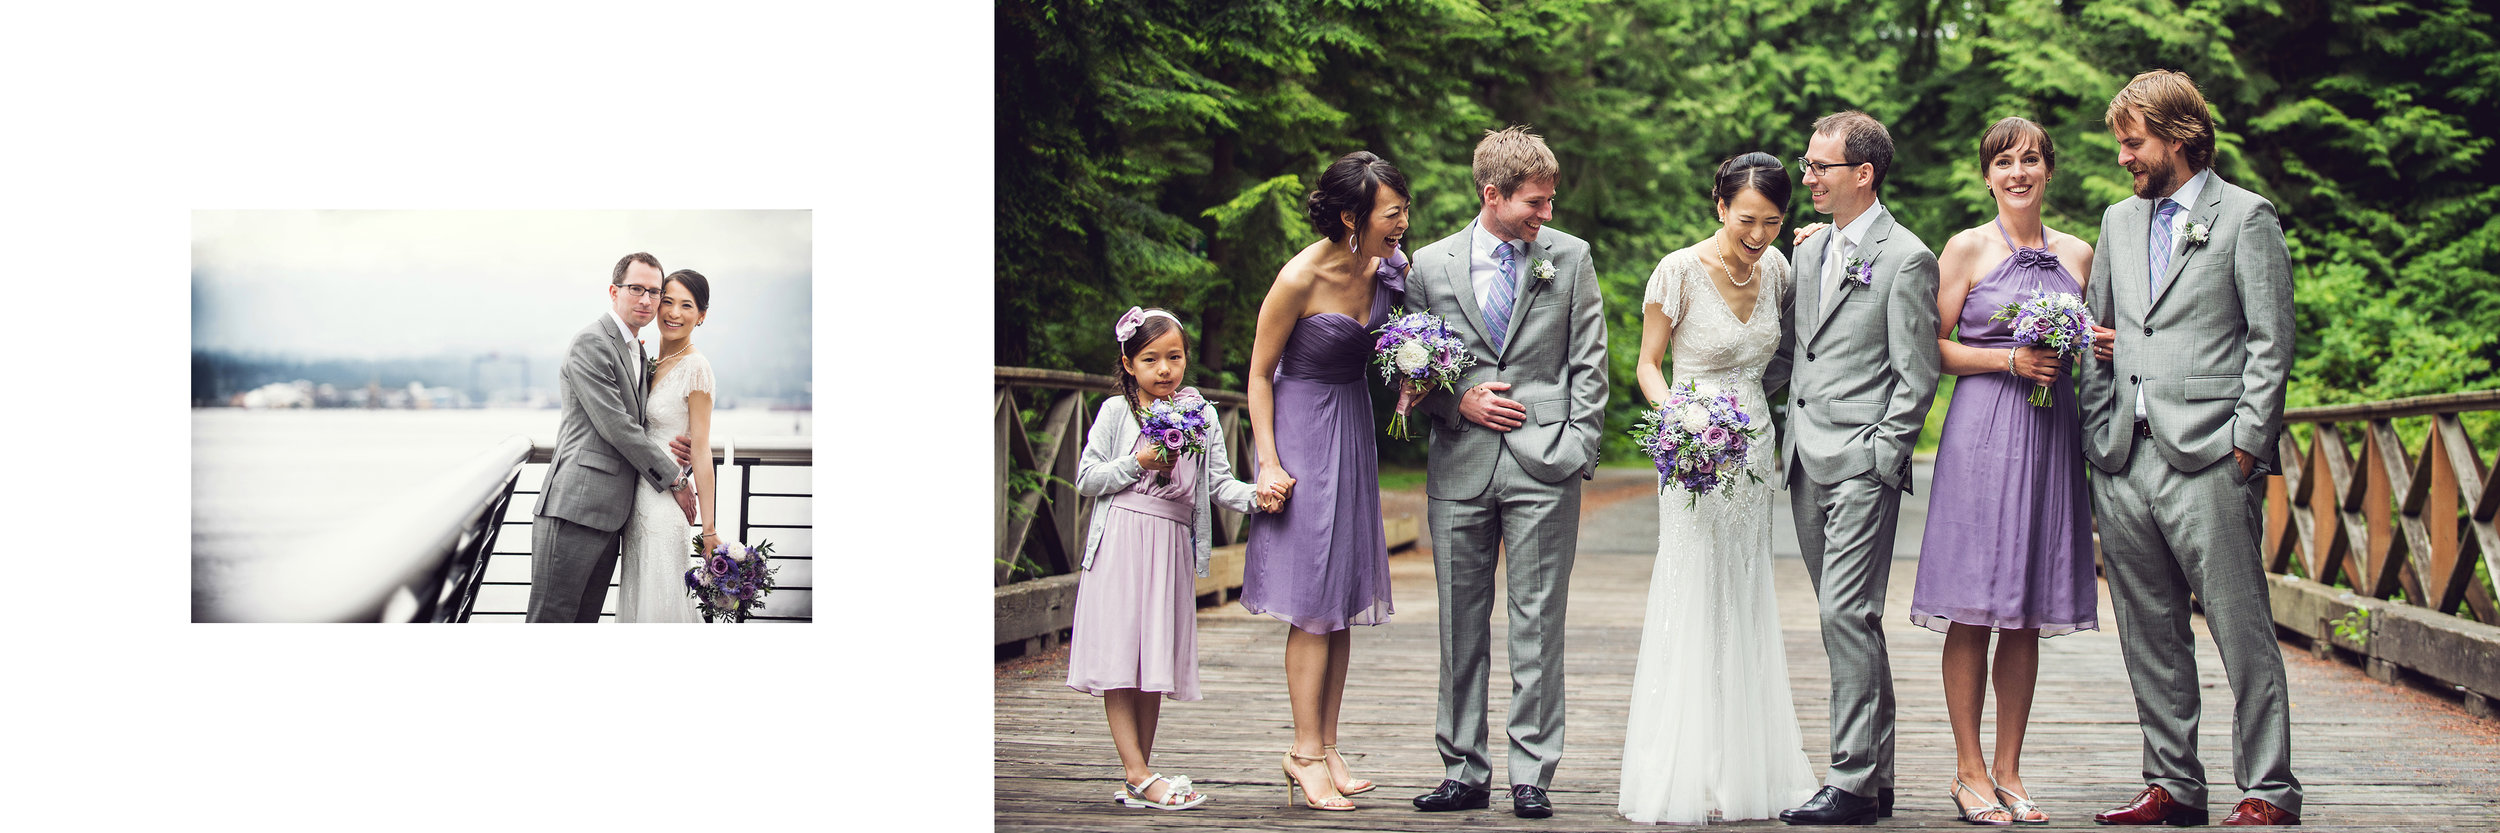 Andrea-Reuben-Grouse-Mountain-Wedding-Real-Weddings-Feature-Yaletown-Photography-008.jpg